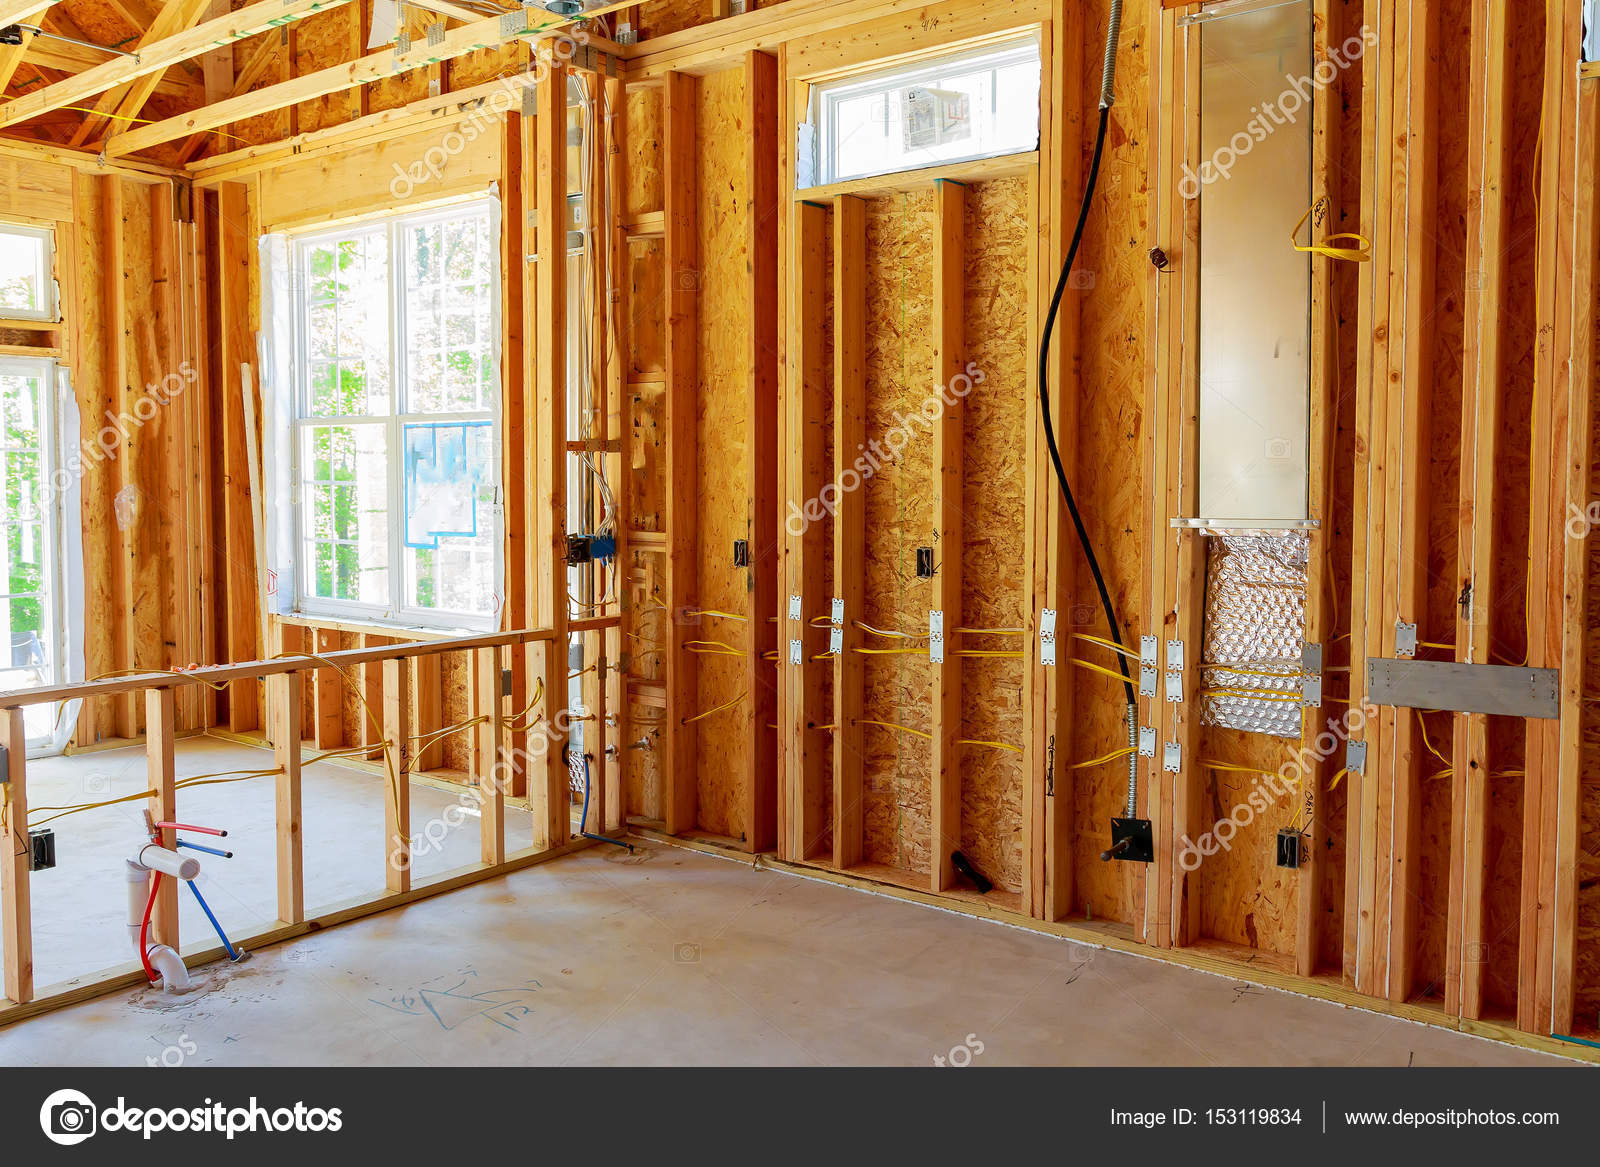 unfertige Haus Gestaltung Innenraum — Stockfoto © photovs #153119834